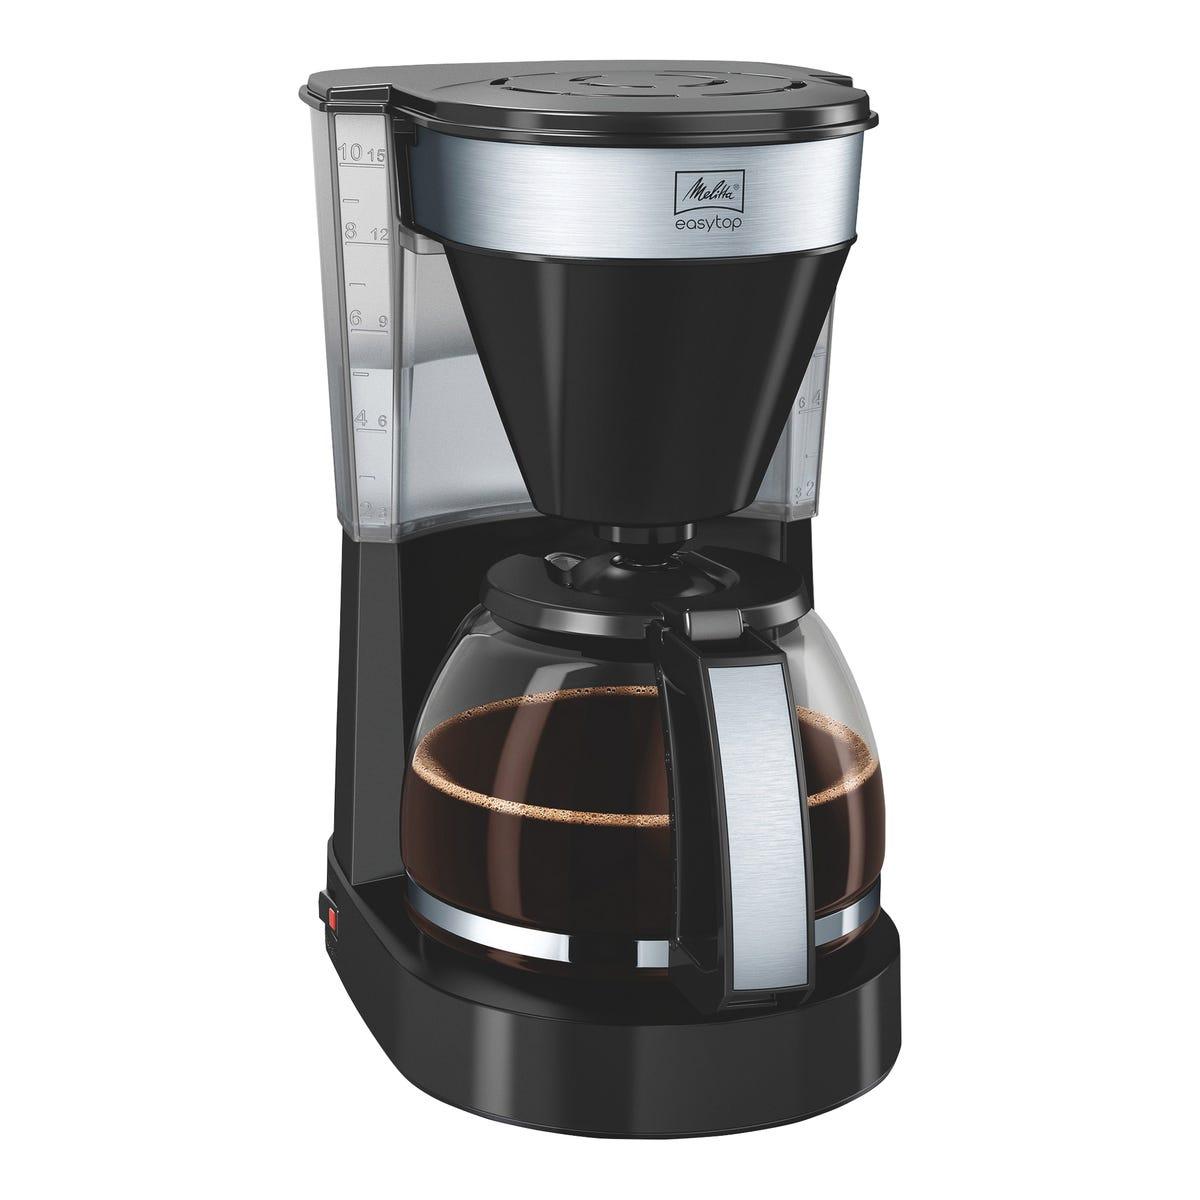 Melitta ML2889 Easytop II 1050W Filter Coffee Machine - Black